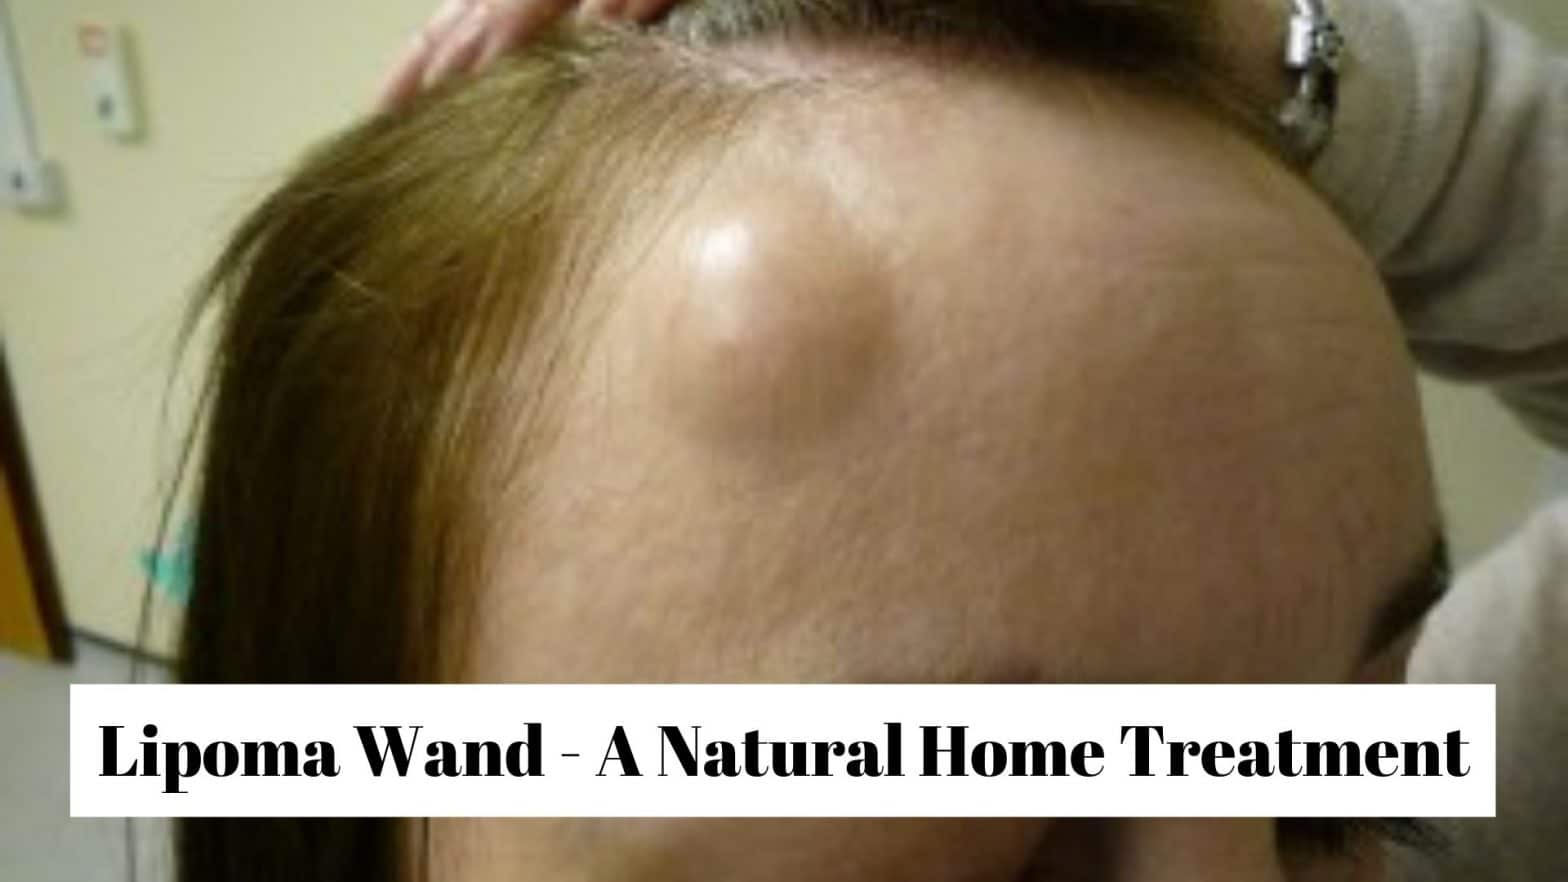 Lipoma Wand - A Natural Home Treatment